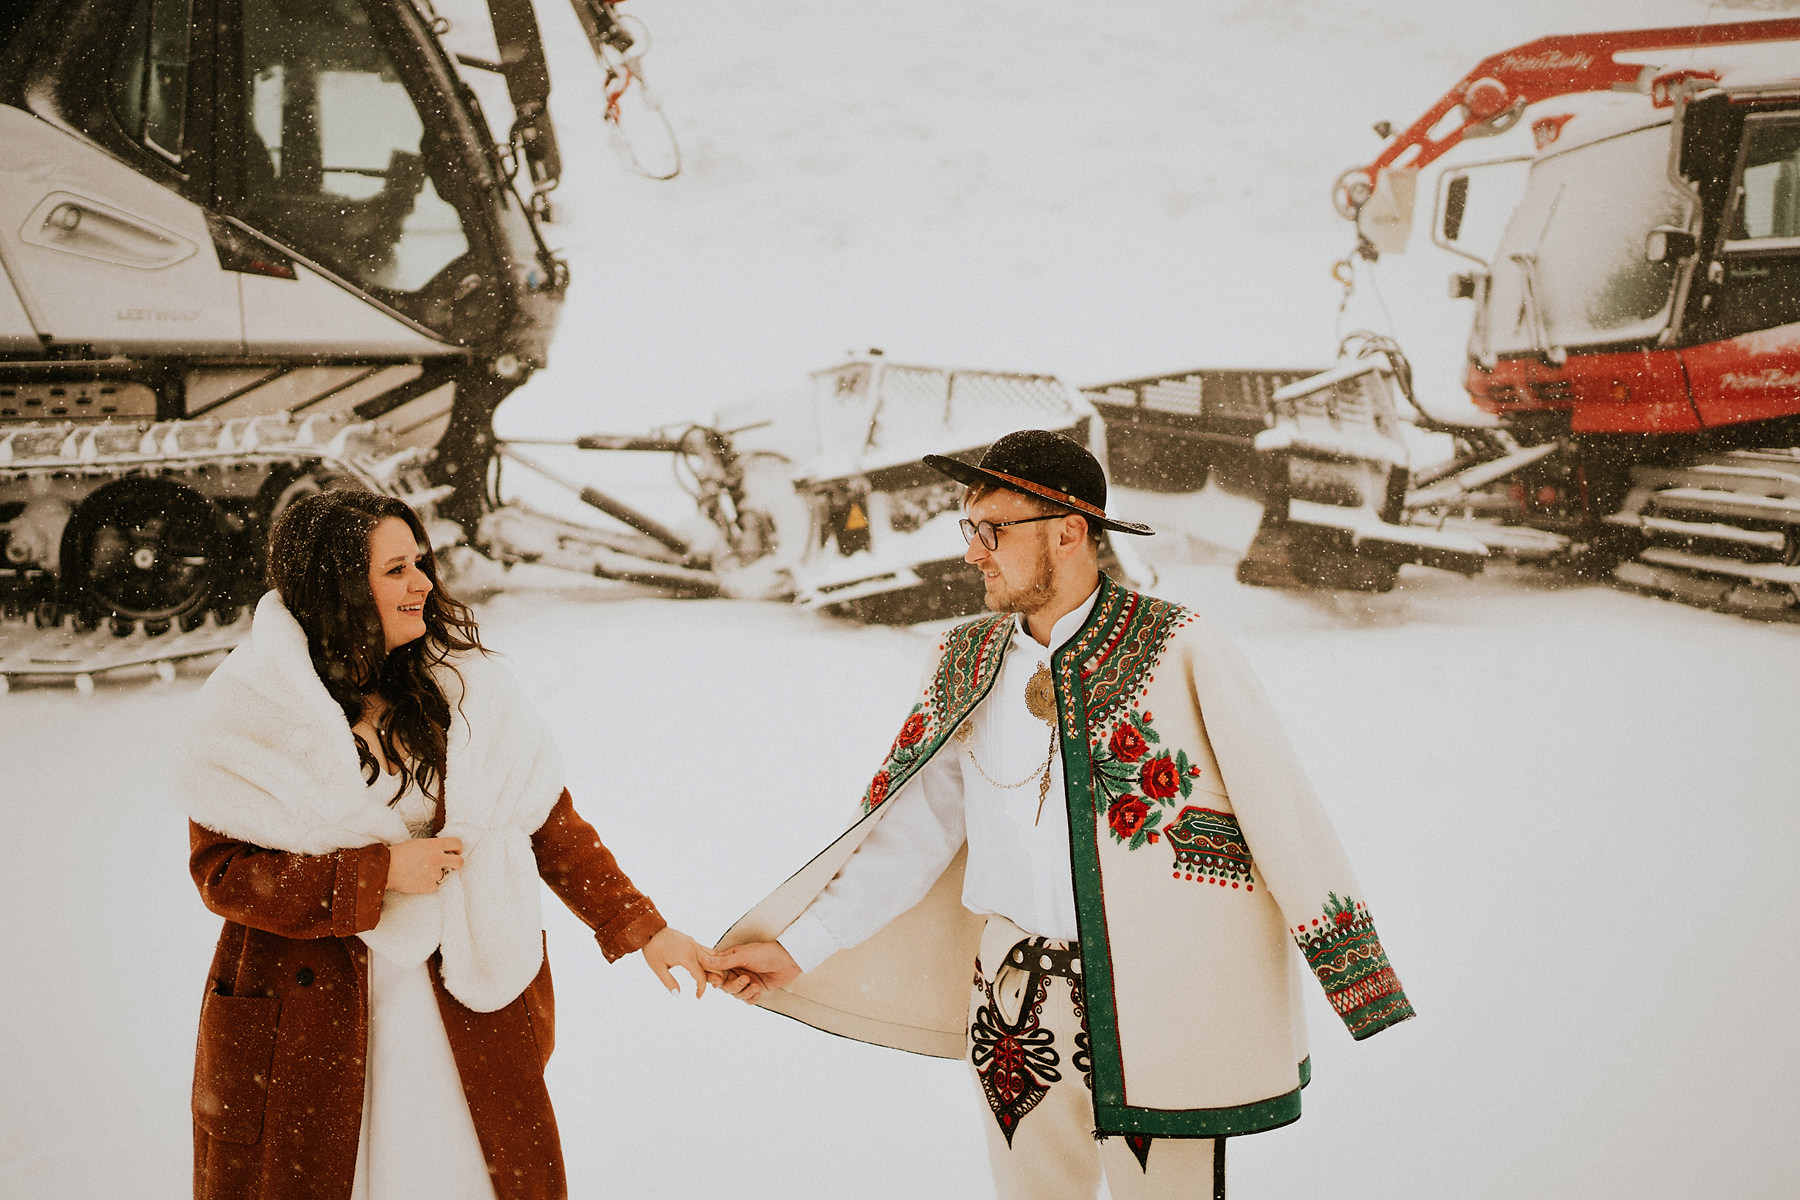 góralska sesja zdjęciowa zimą